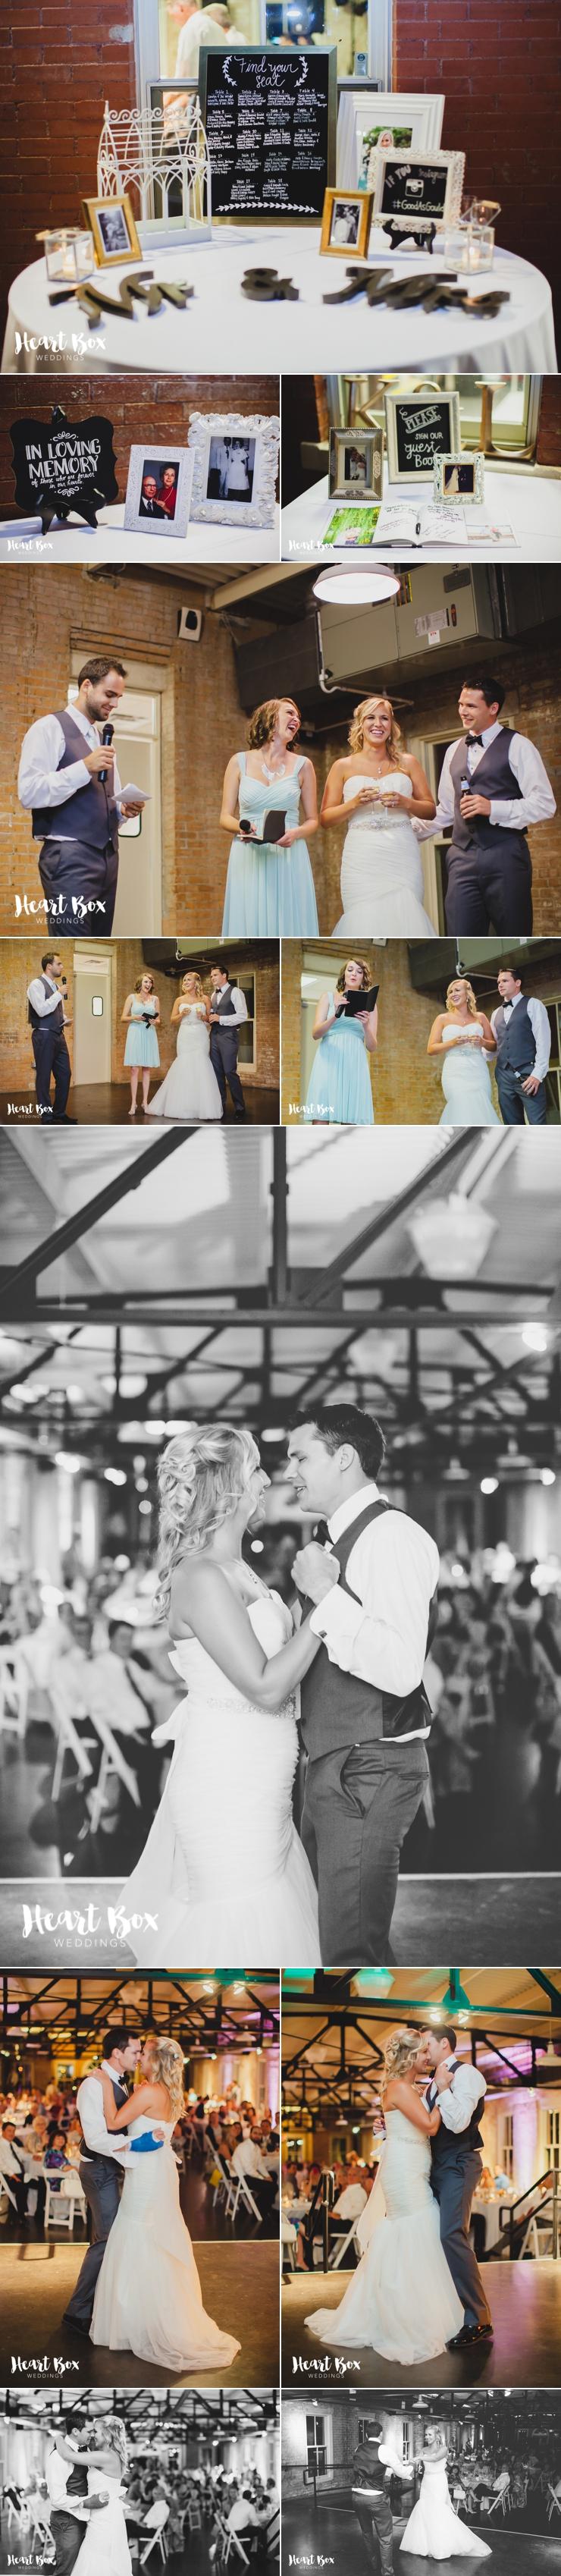 Gould Wedding Blog Collages 18.jpg